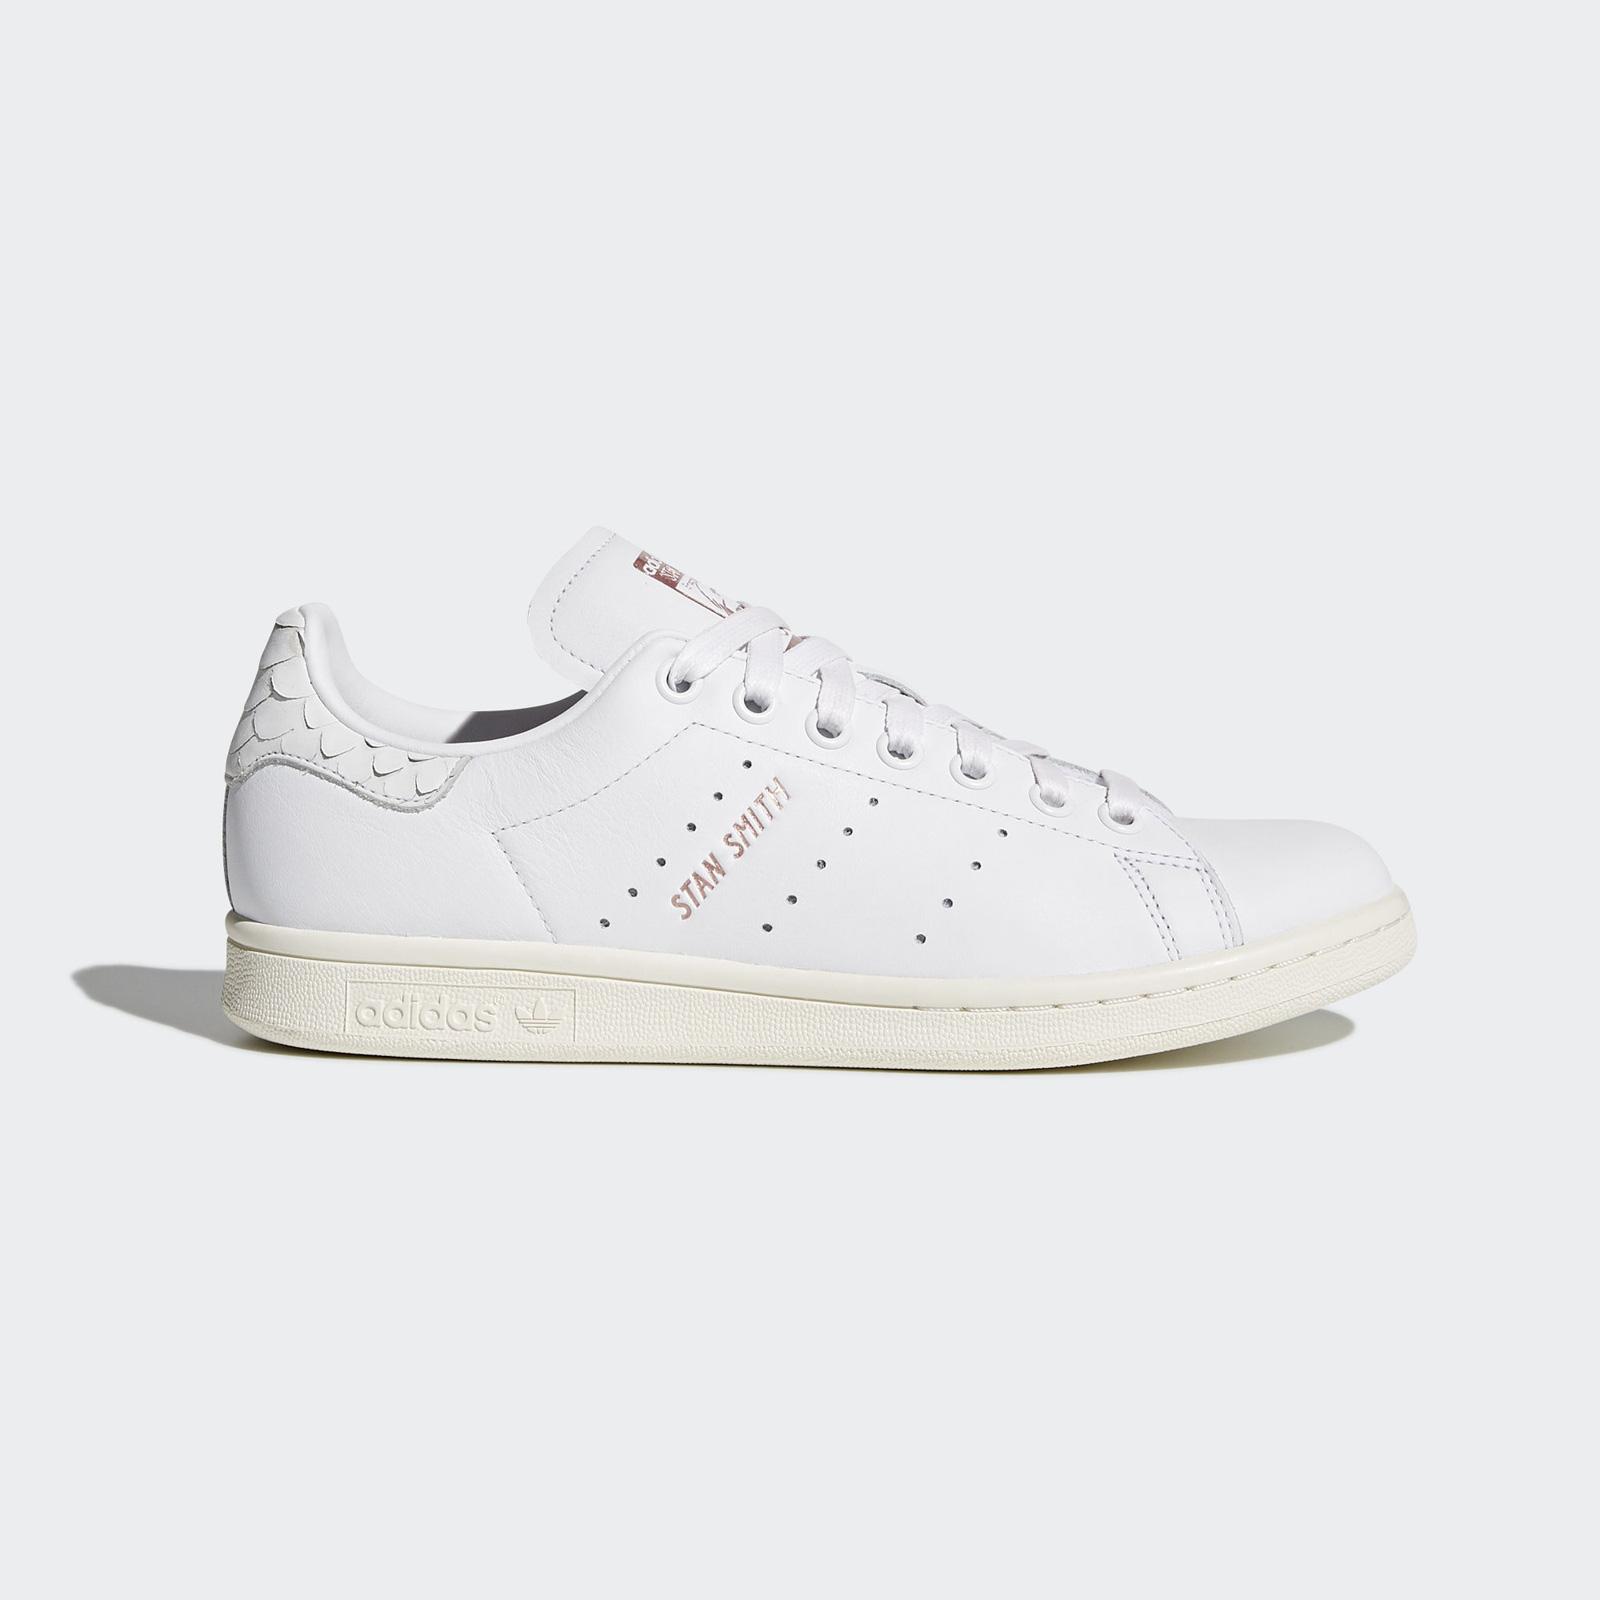 4b62a925d adidas Stan Smith W - Cq2810 - Sneakersnstuff